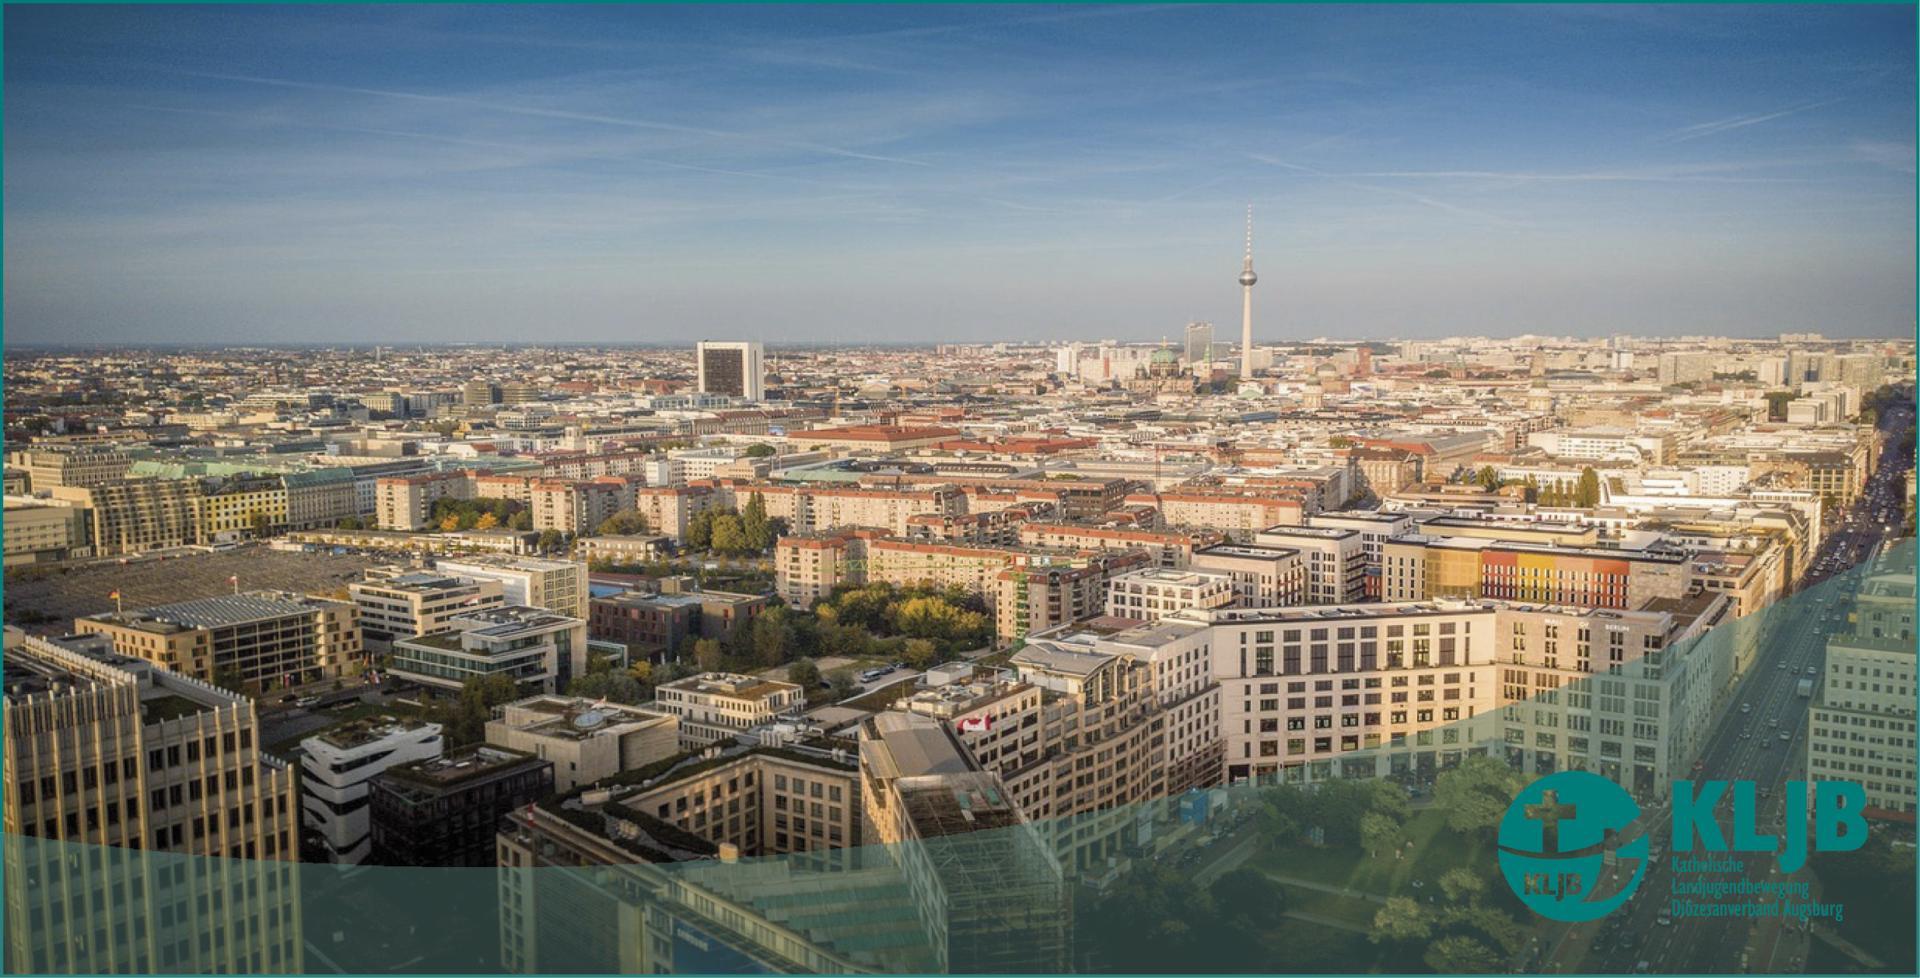 IGW-Fahrt 2019